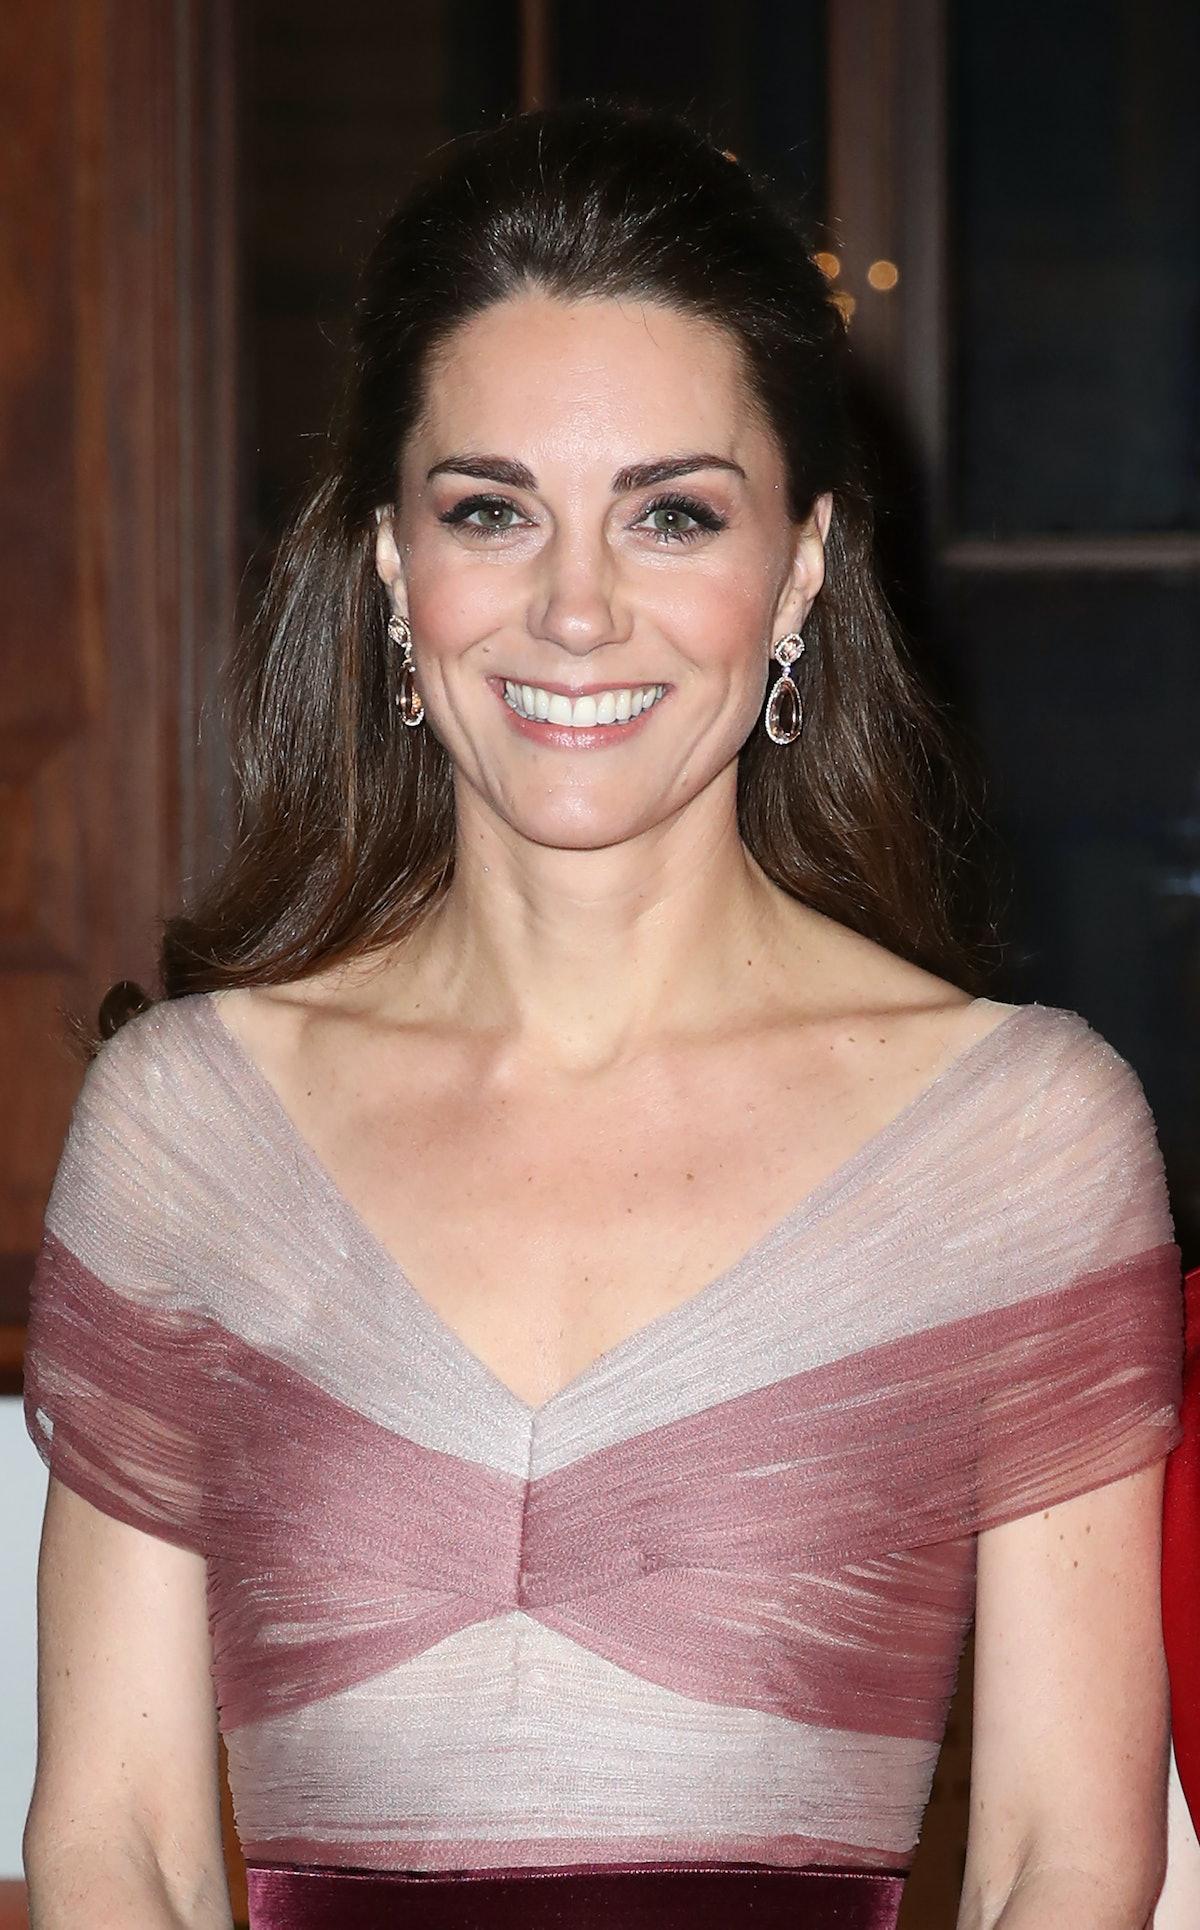 The Duchess Of Cambridge Attends 100 Women In Finance Gala Dinner